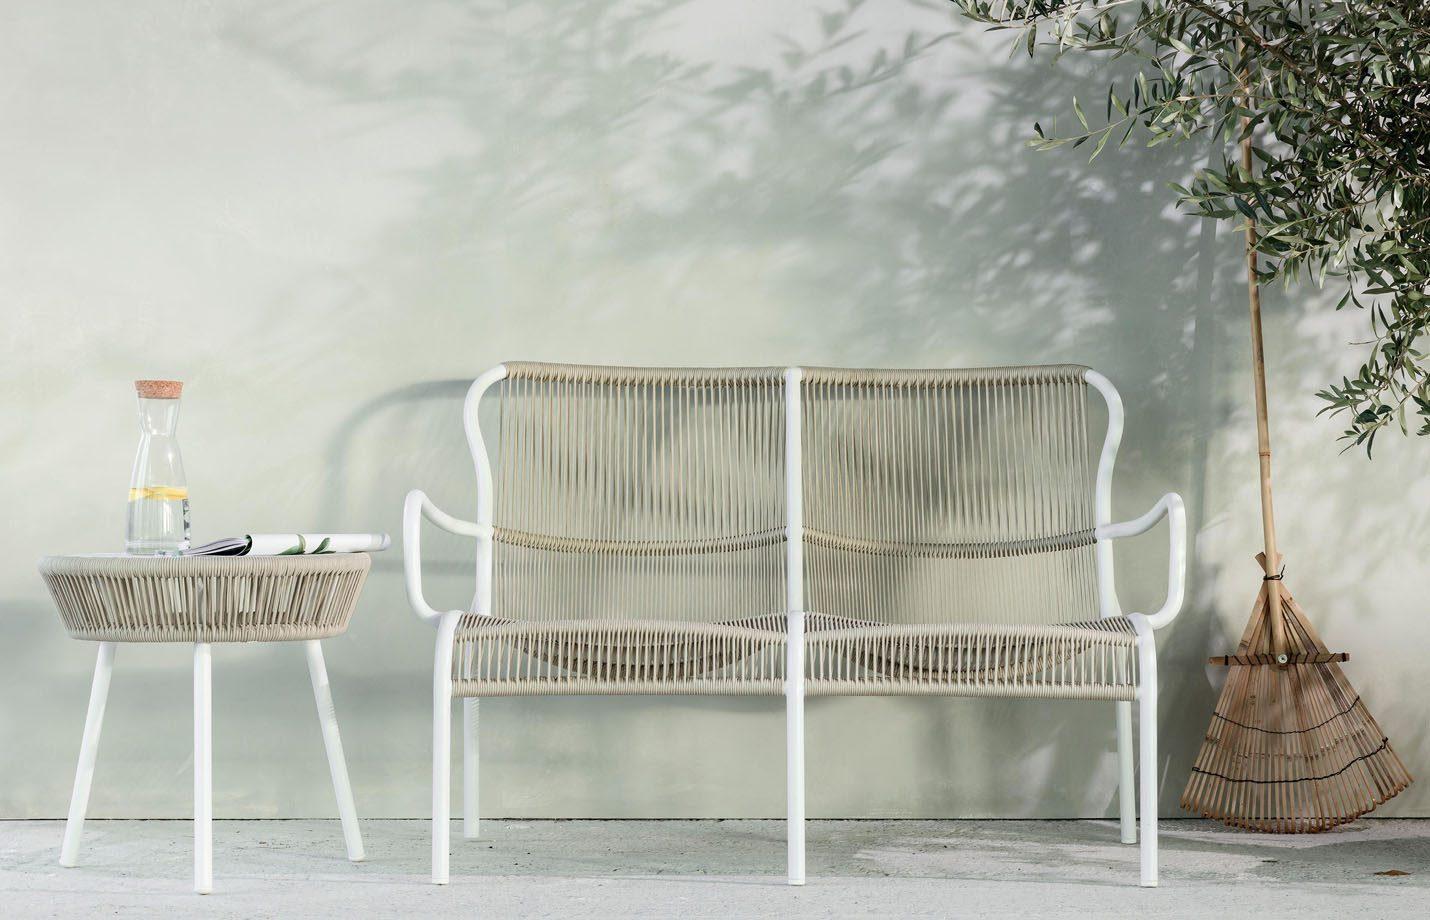 Loop-sofa-rope-outdoor-LS01